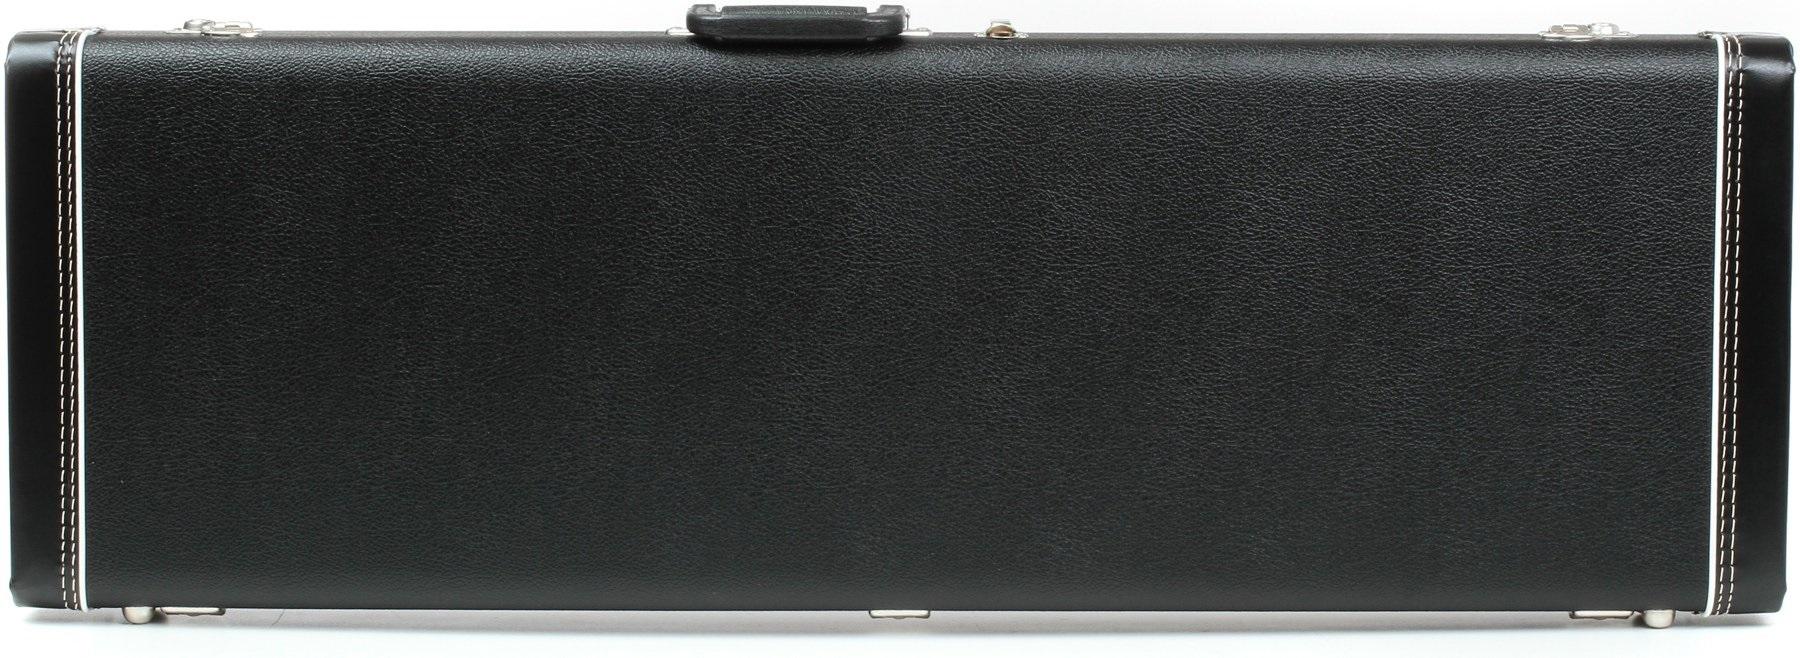 Fender G&G Standard Hardshell Case Black - Mustang/Jag-Stang/Cyclone